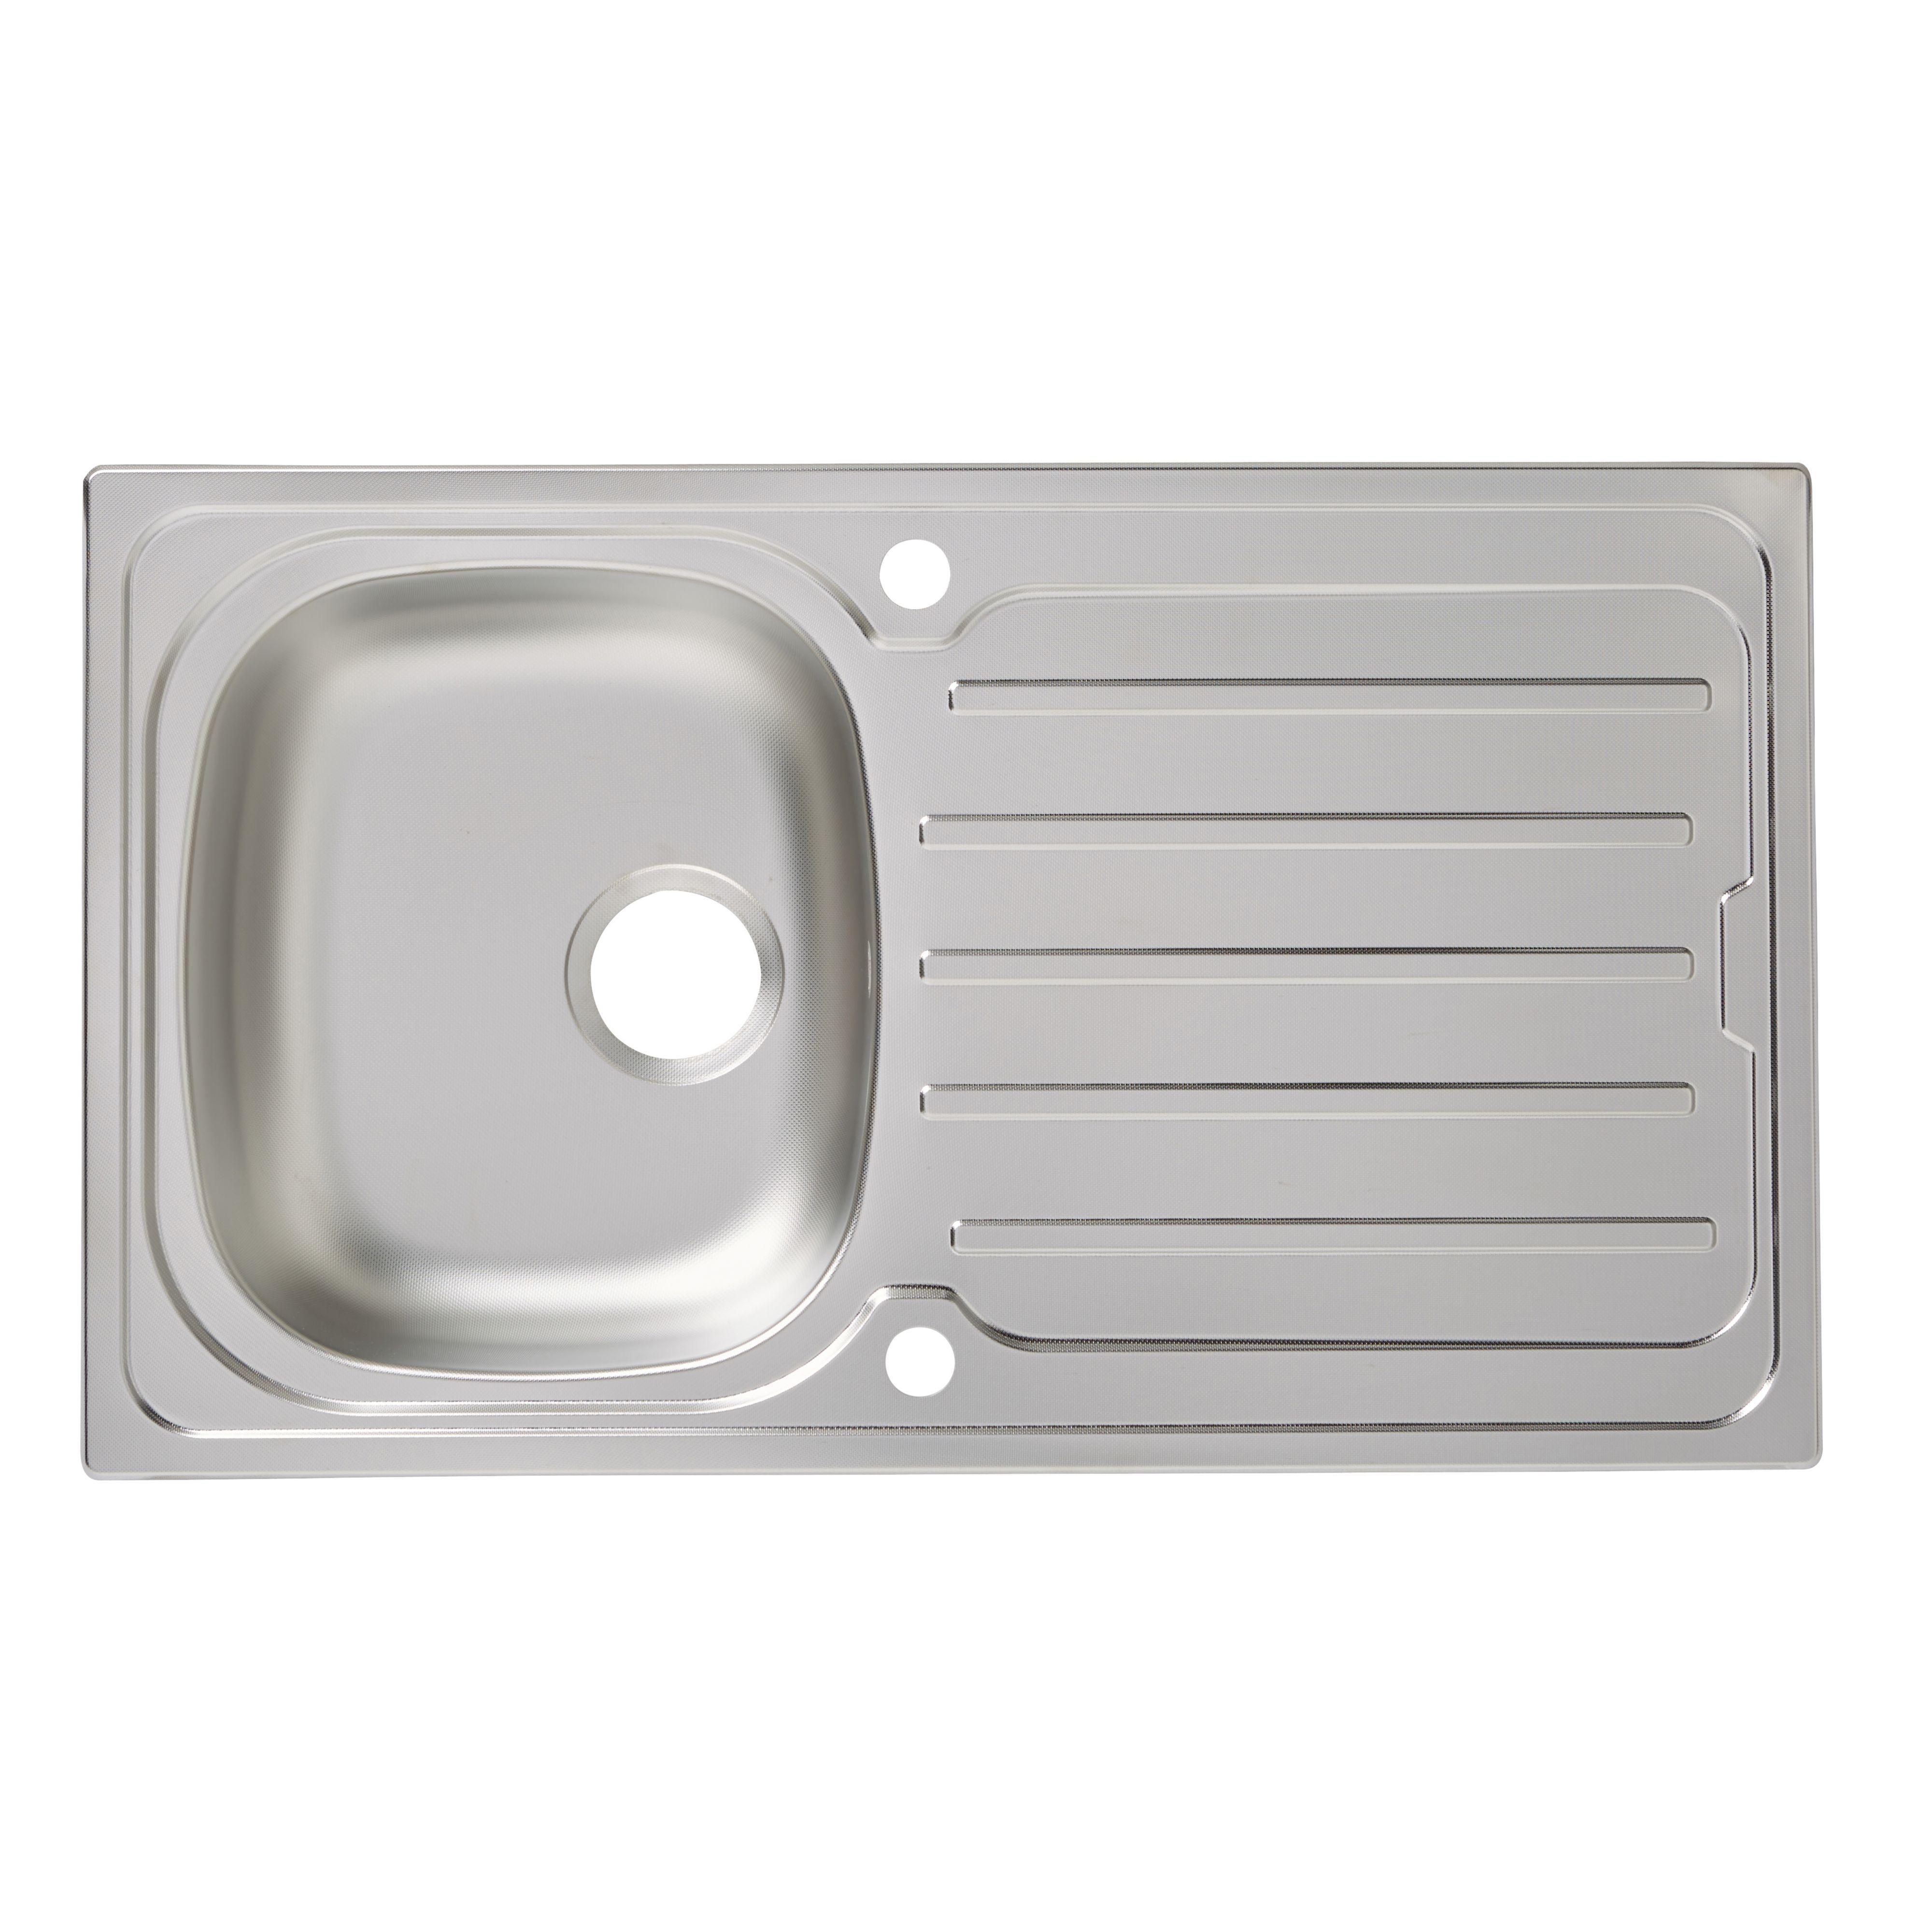 Cooke & Lewis Nakaya 1 Bowl Linen Finish Stainless Steel Sink & Drainer